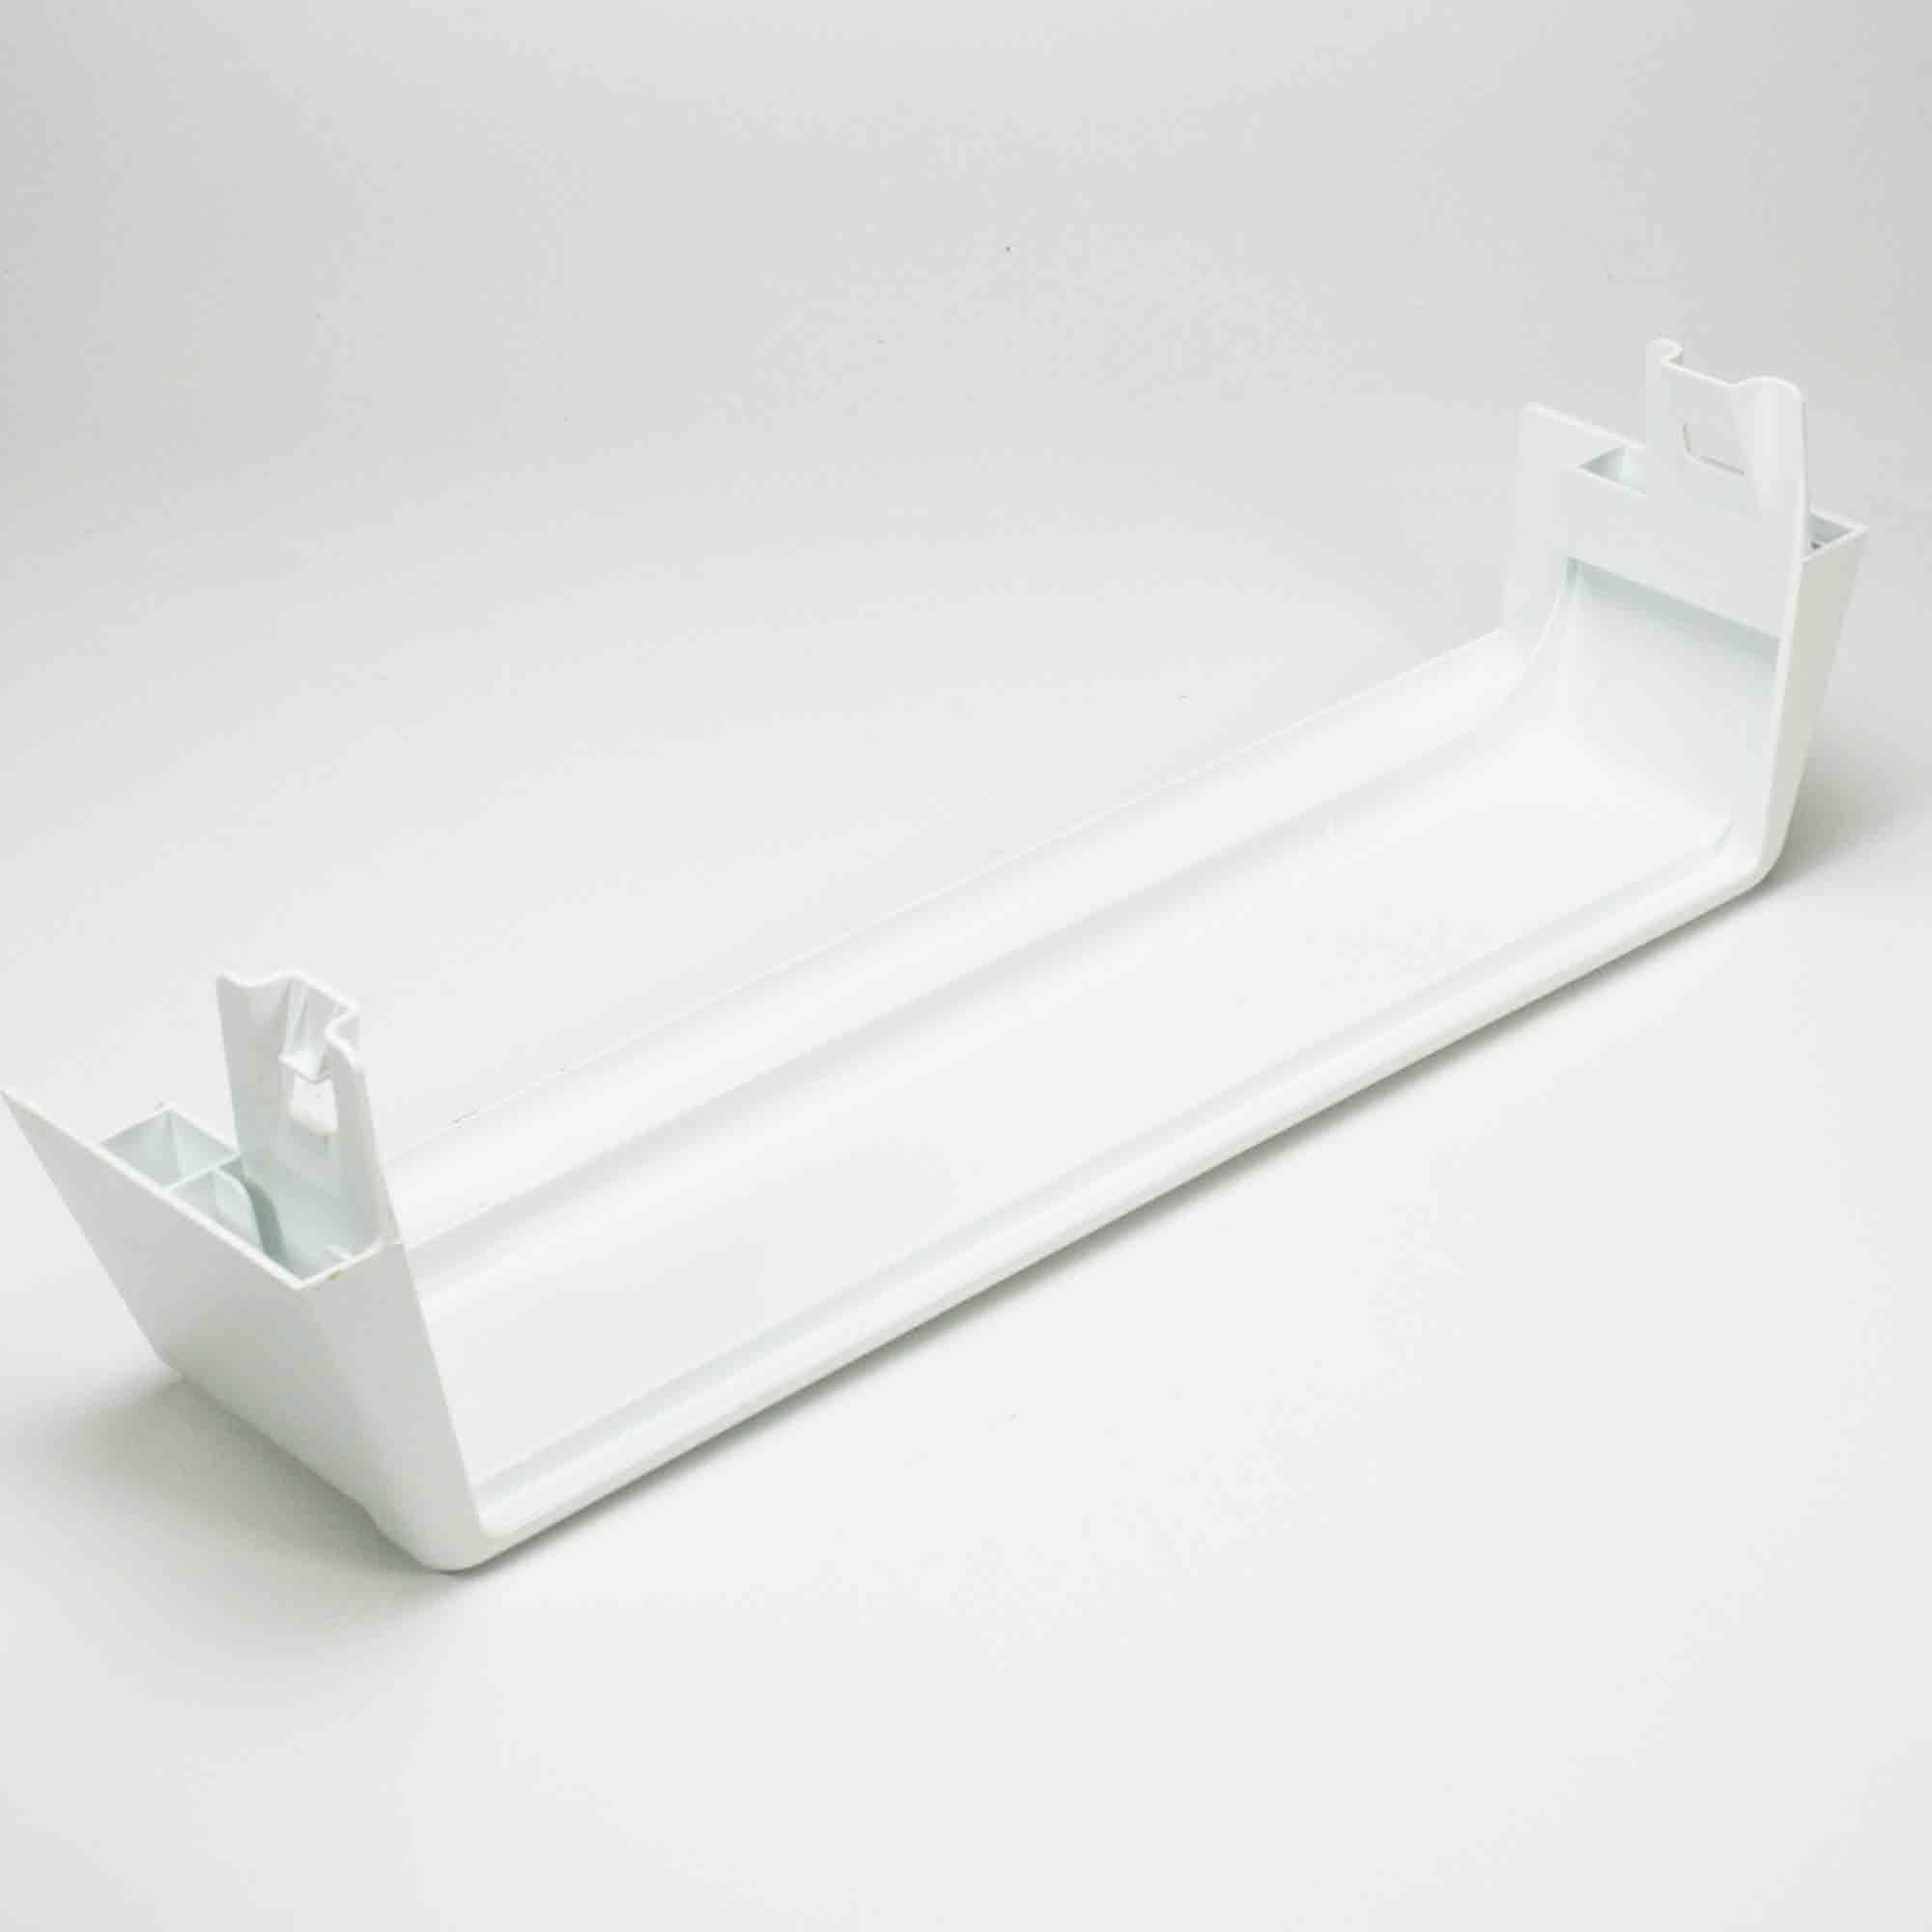 wp2156022 for whirlpool refrigerator door shelf bar ebay. Black Bedroom Furniture Sets. Home Design Ideas